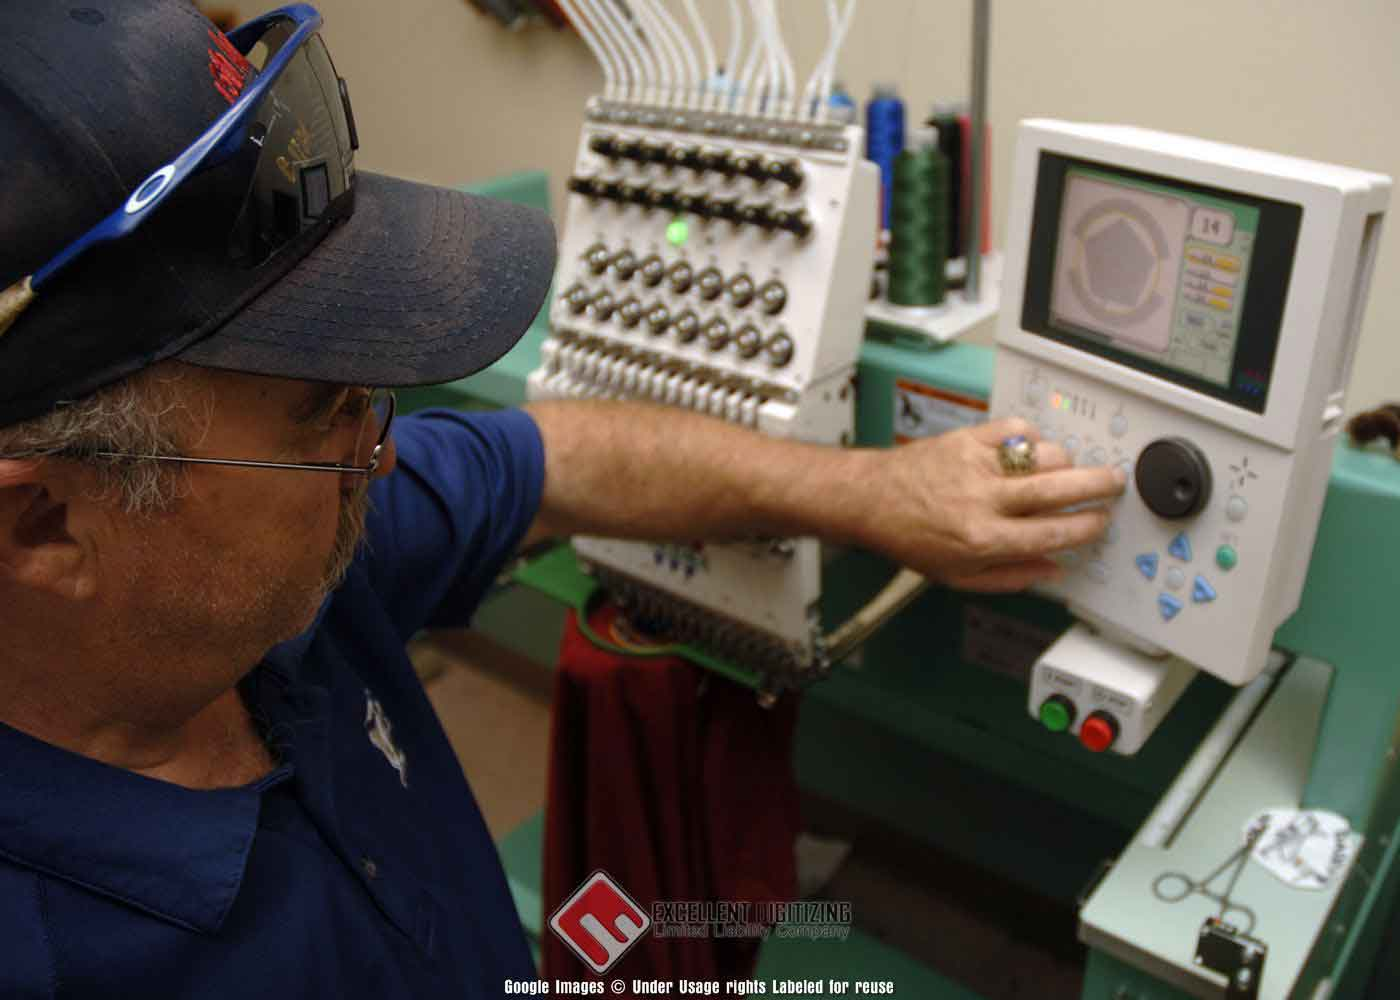 digitizing embroidery machine